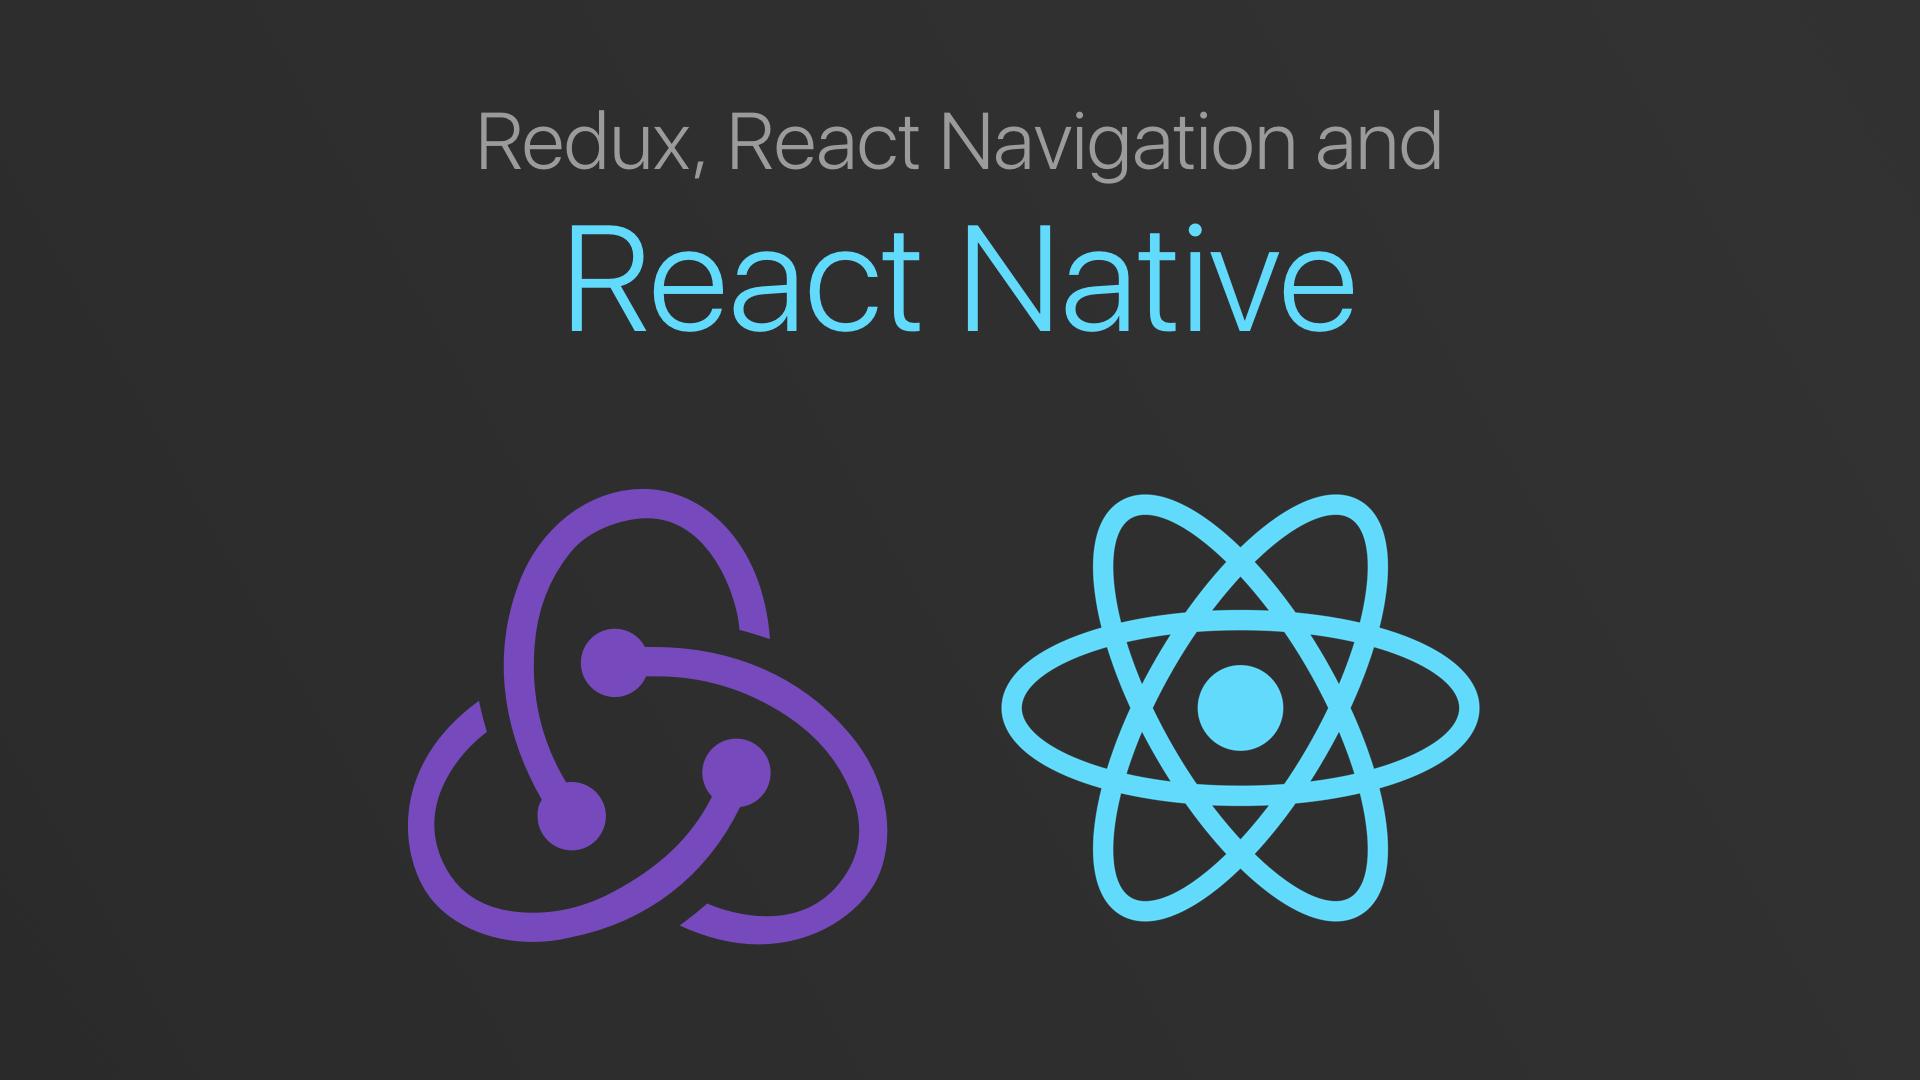 Redux, React Navigation, and React Native | developerlife com